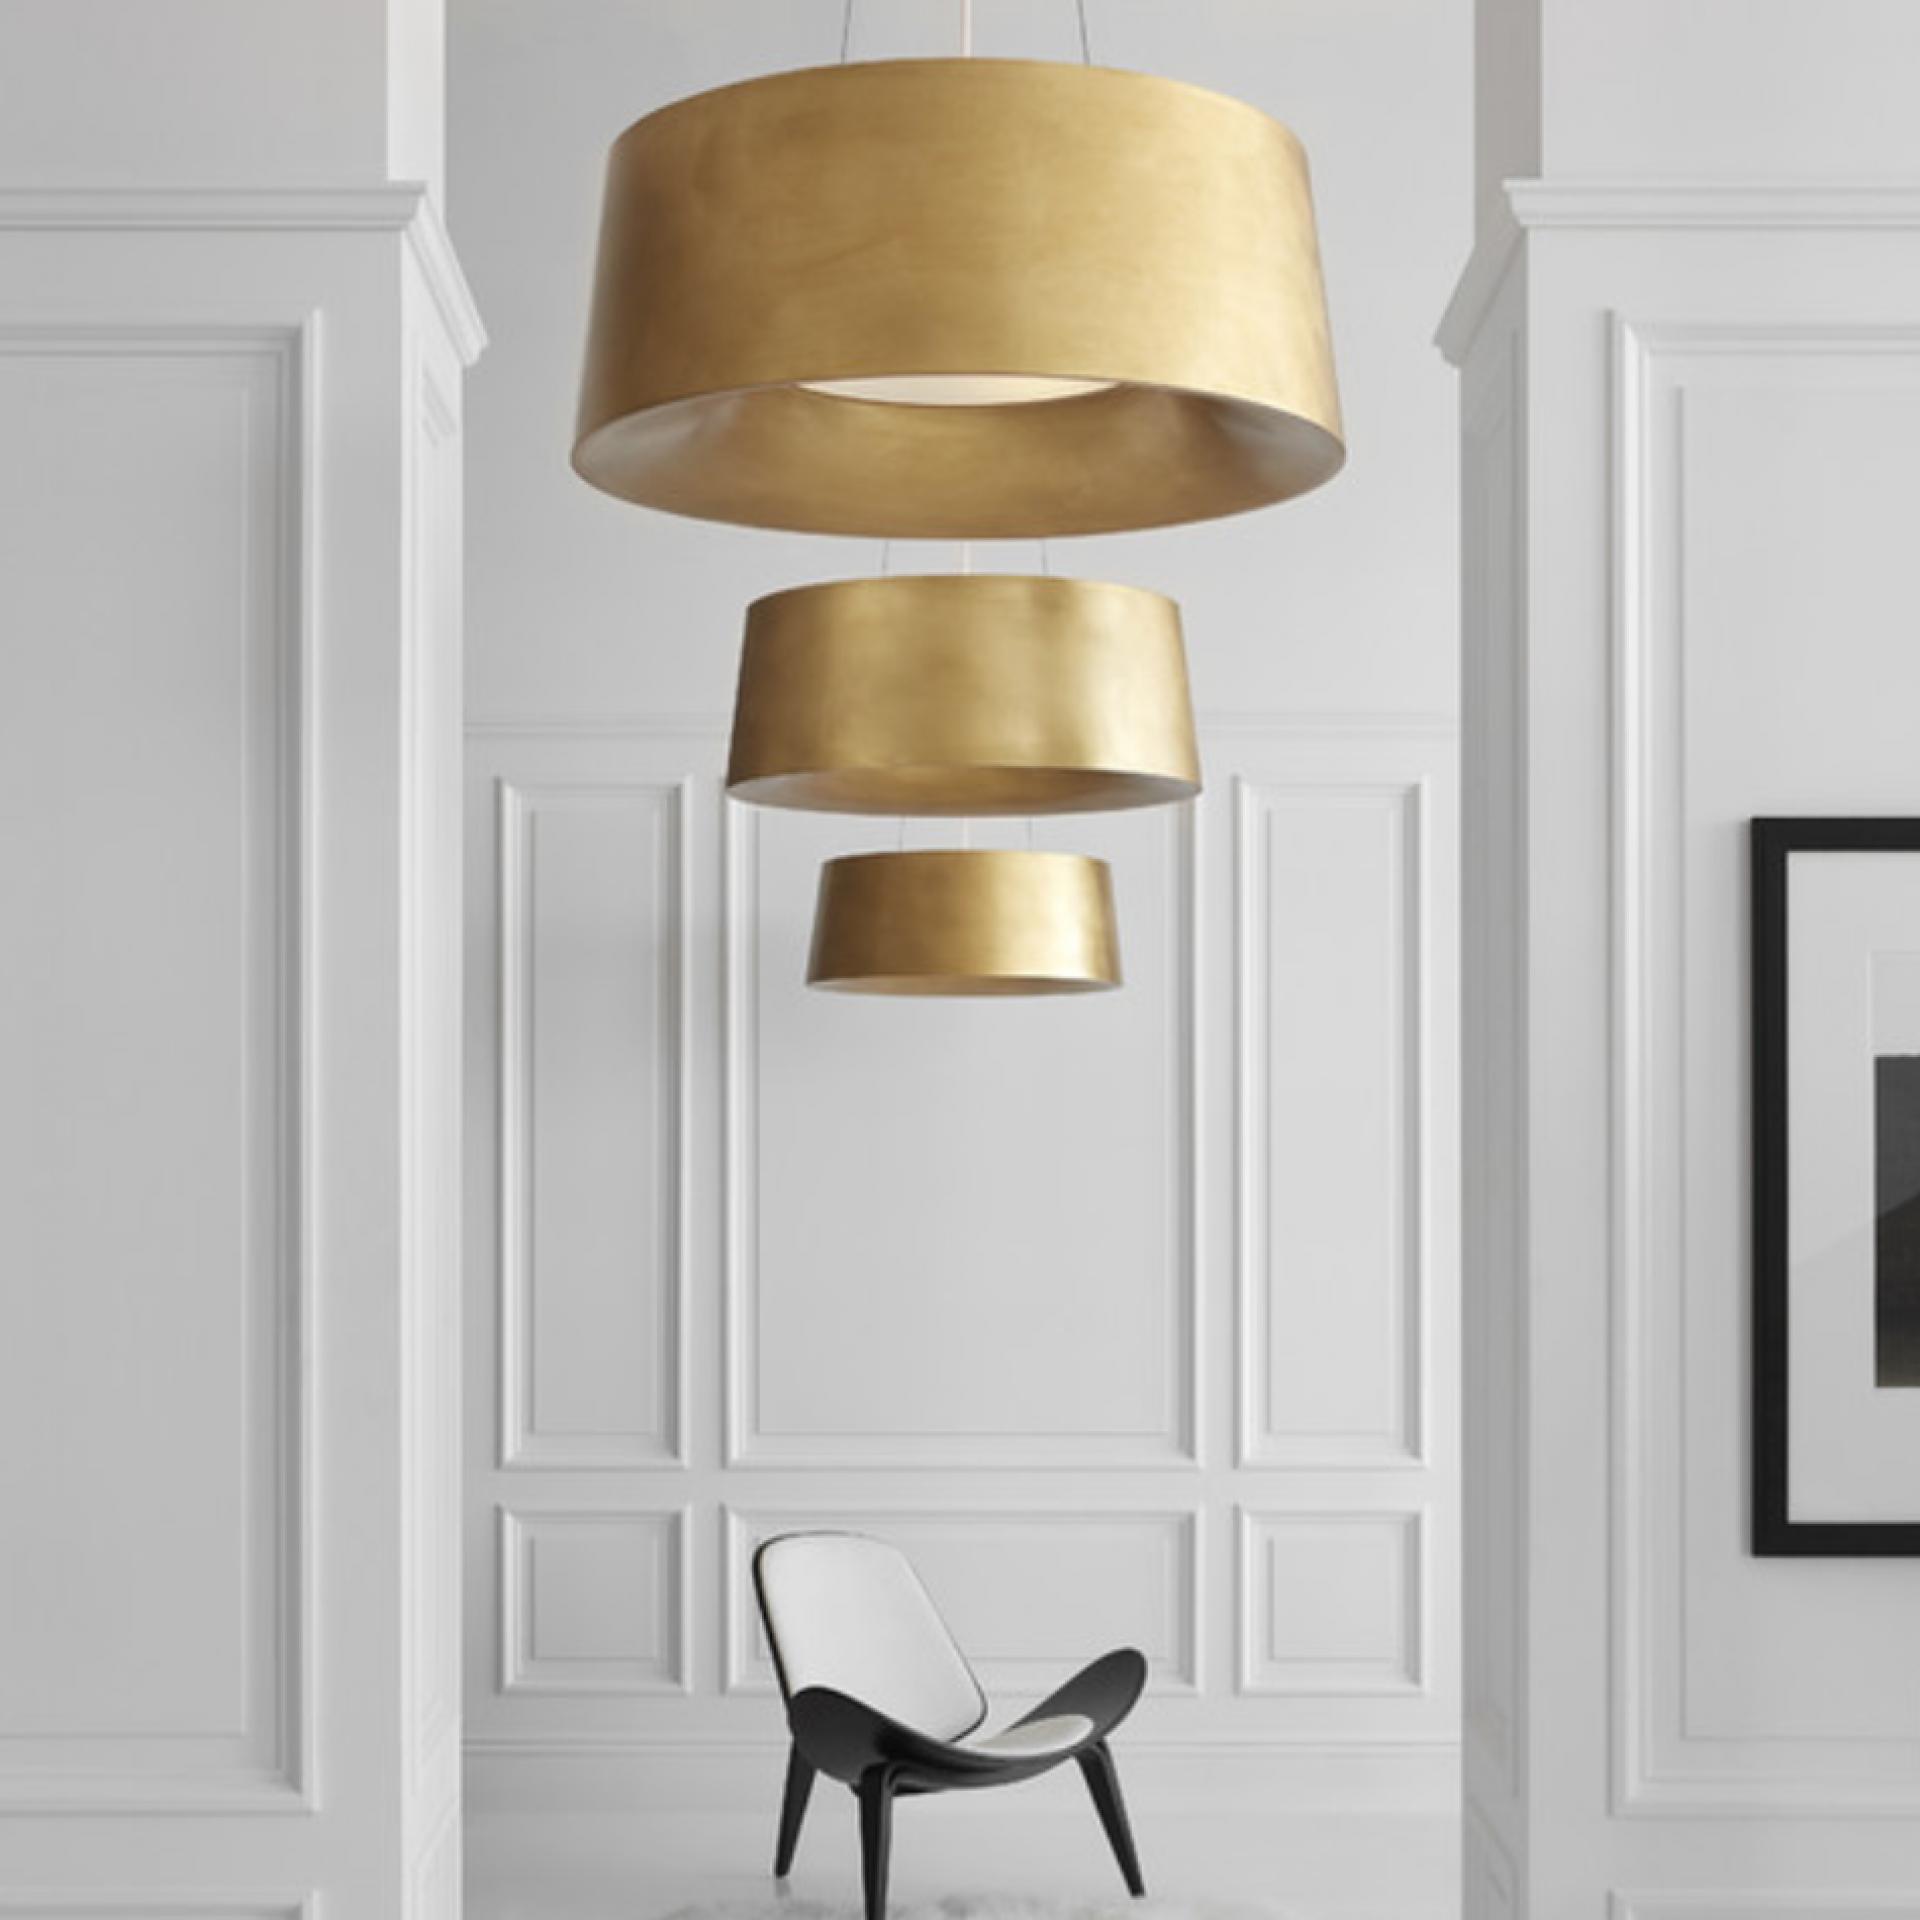 Ceiling Light Ideas